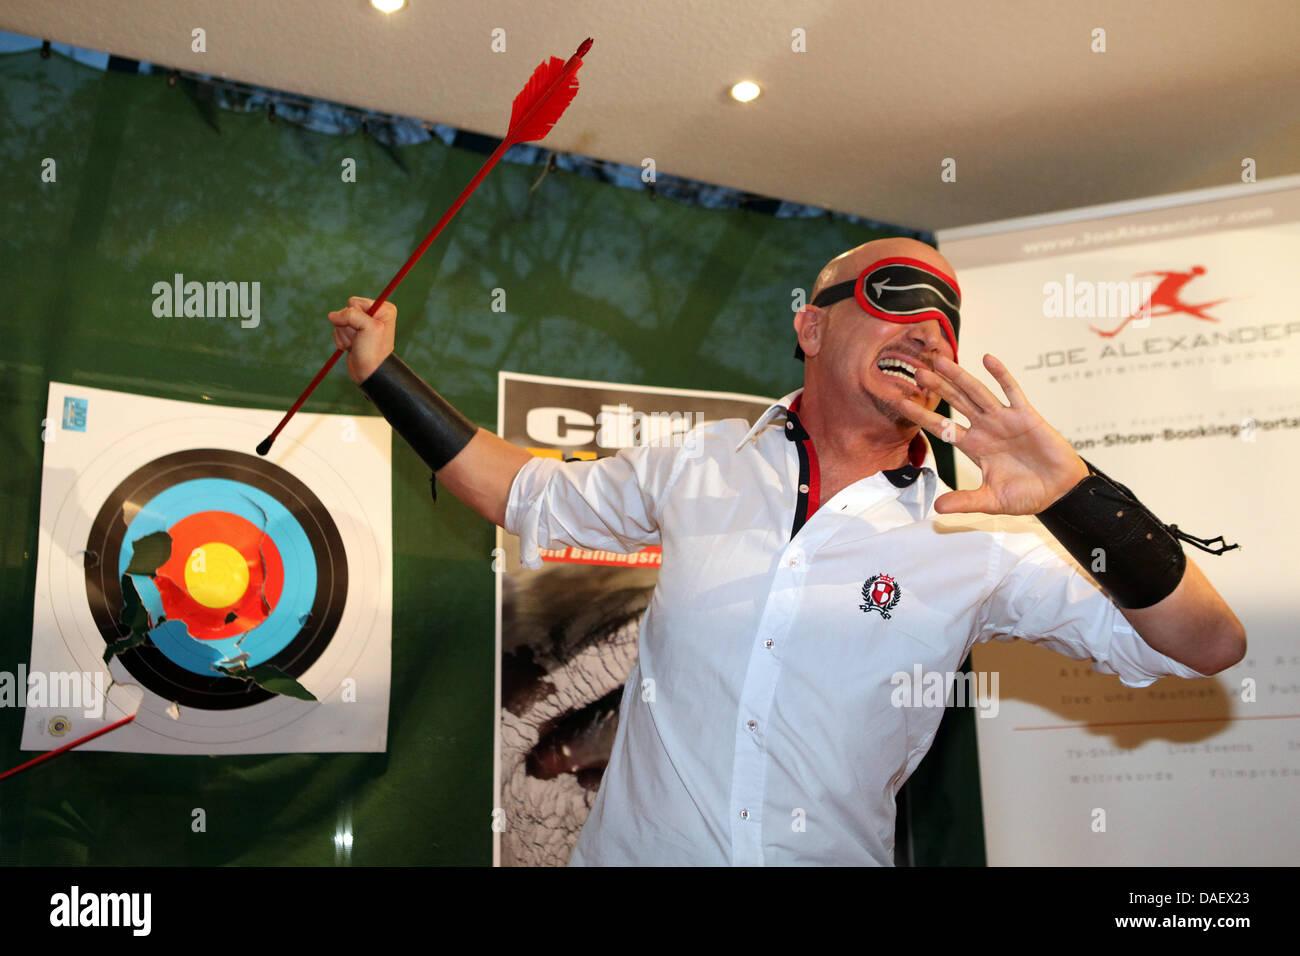 Stuntman Joe Alexander catches an arrow shot from a bow blindfolded in Hamburg,Germany, 16 November 2011. - Stock Image